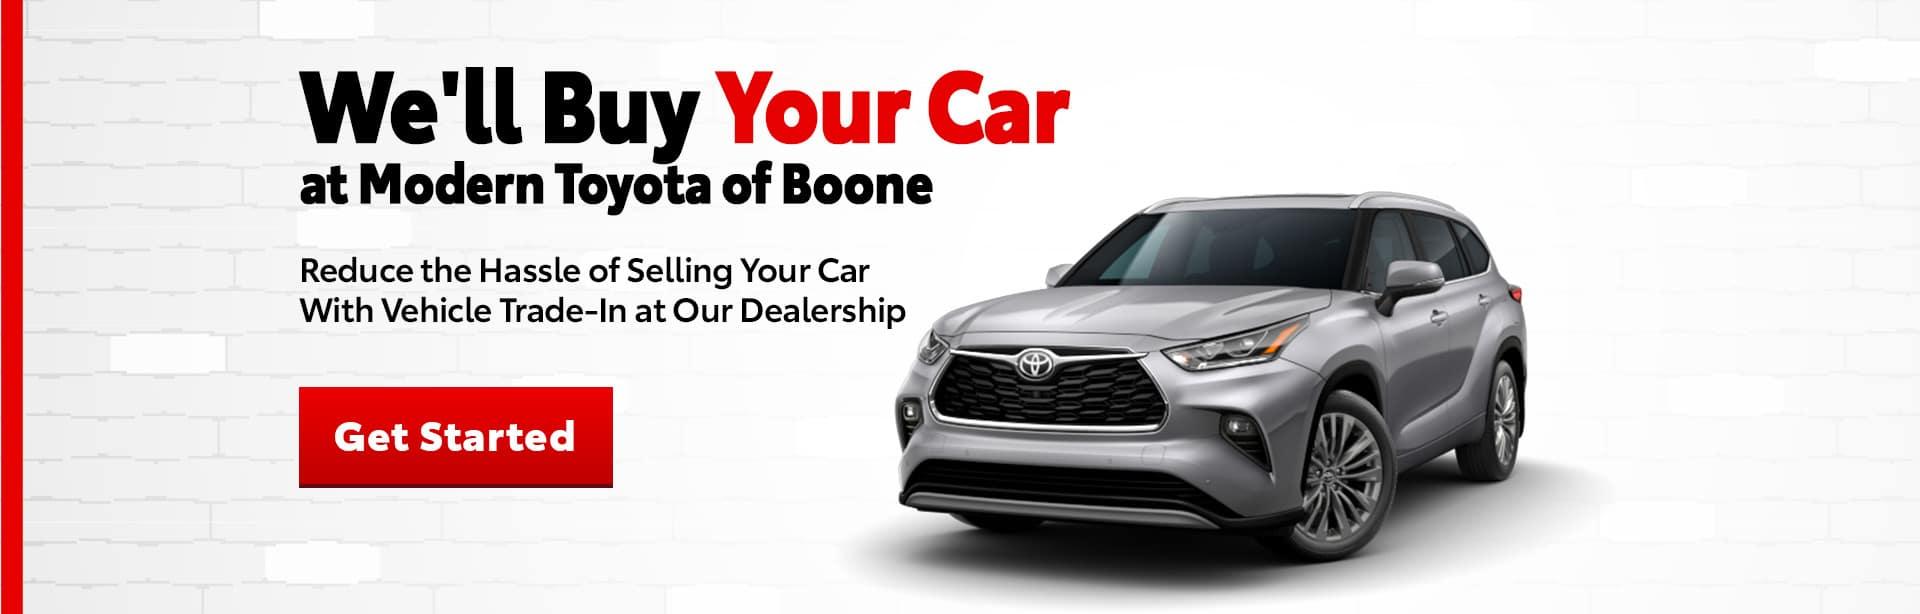 We'll Buy Your Car – desktop